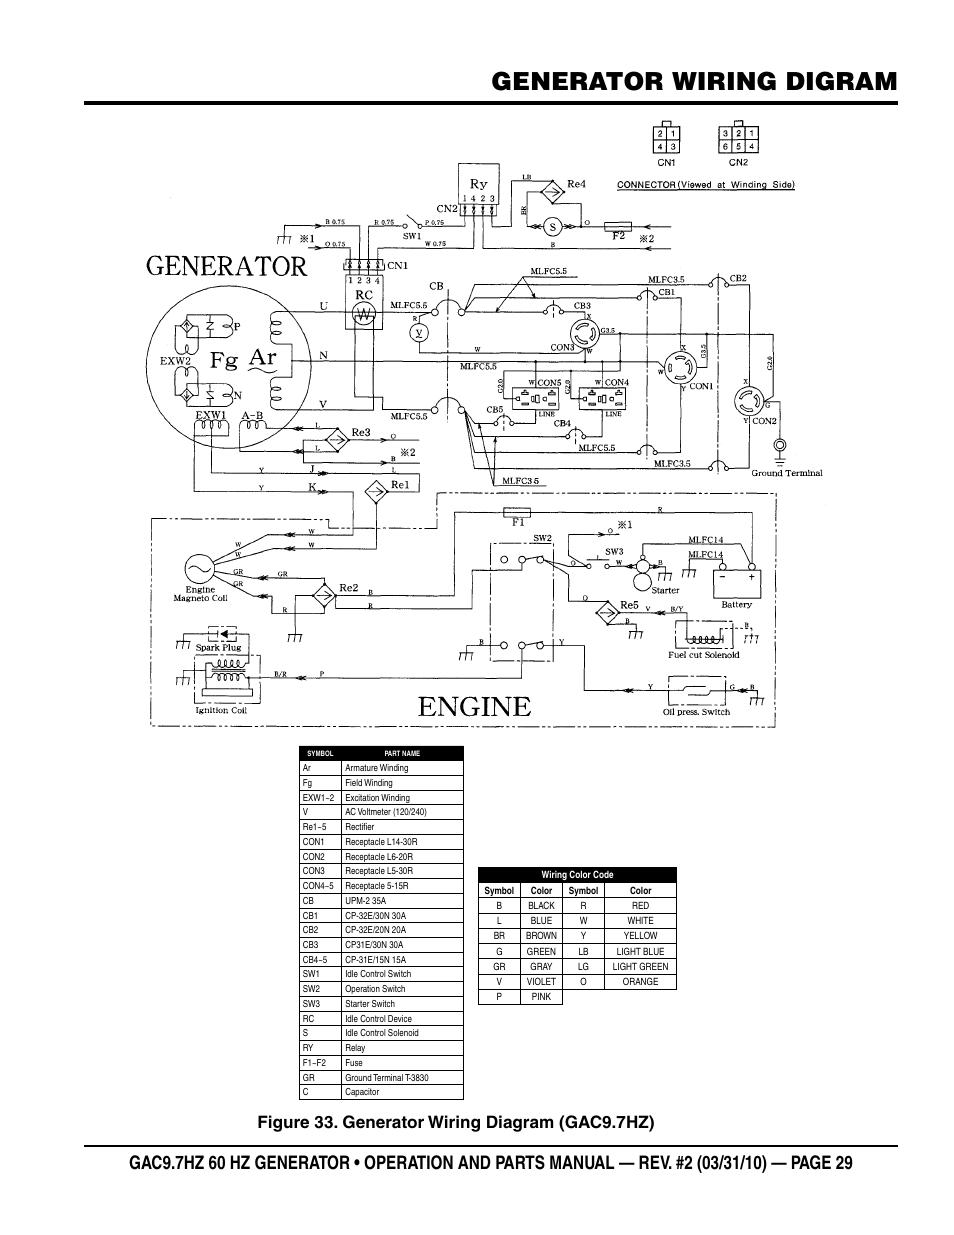 L15 30r Wiring Diagram L14-20R Wiring Diagram Wiring